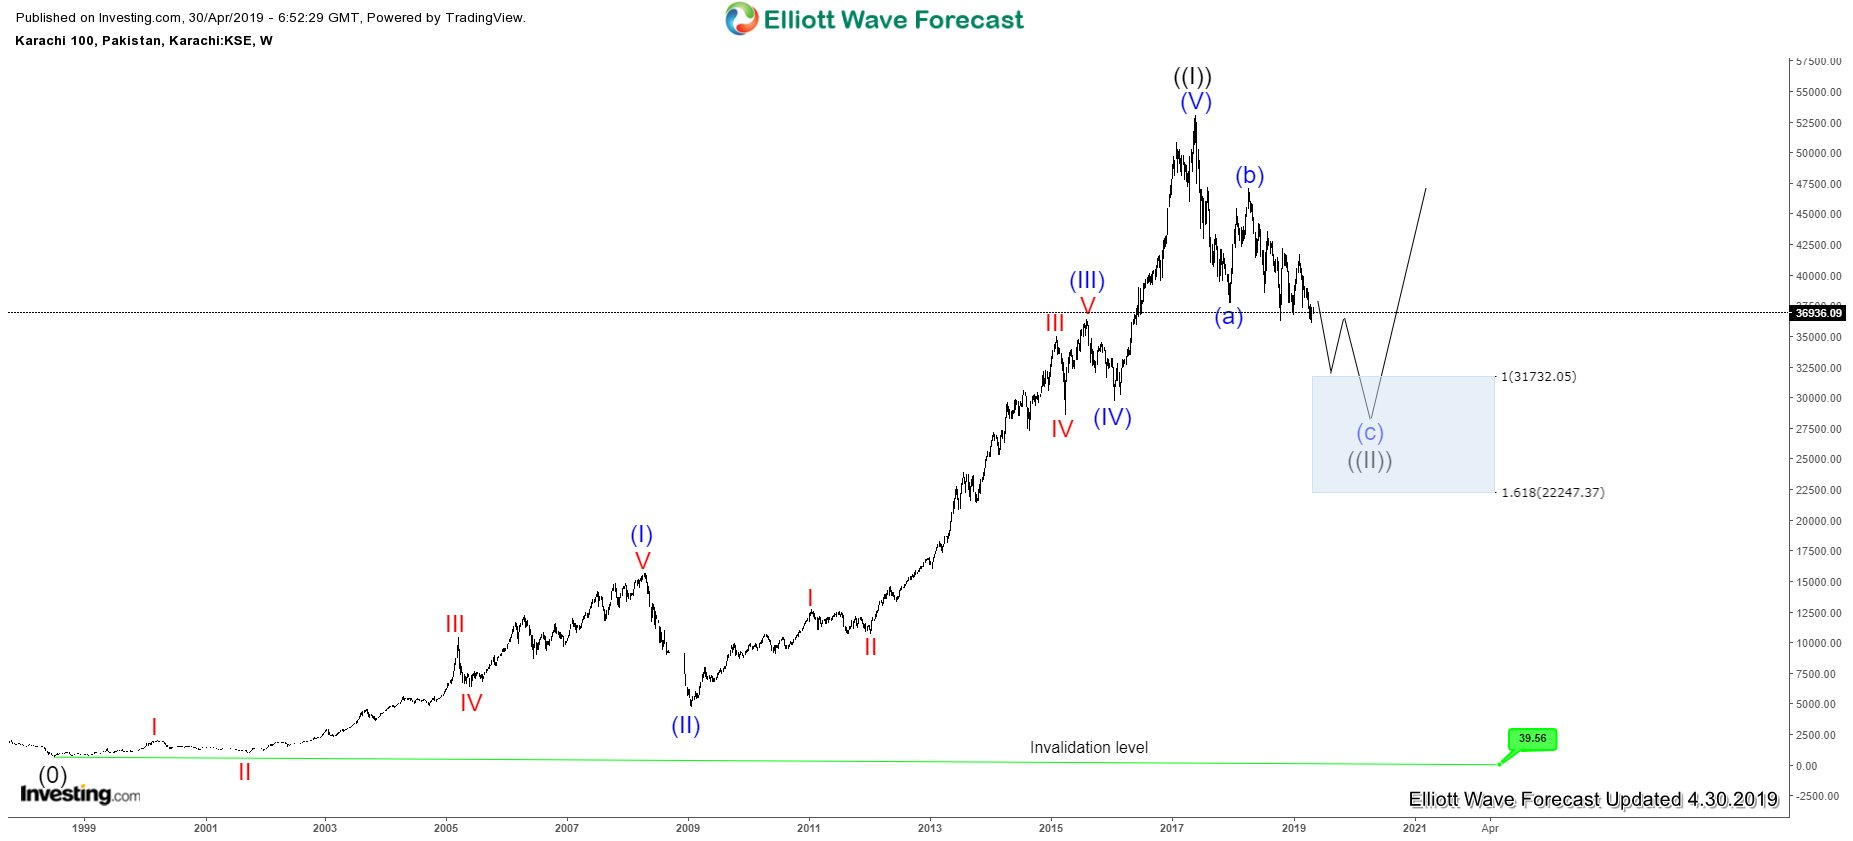 Karachi Stock Exchange ( KSE-100 ) Elliott Wave Analysis